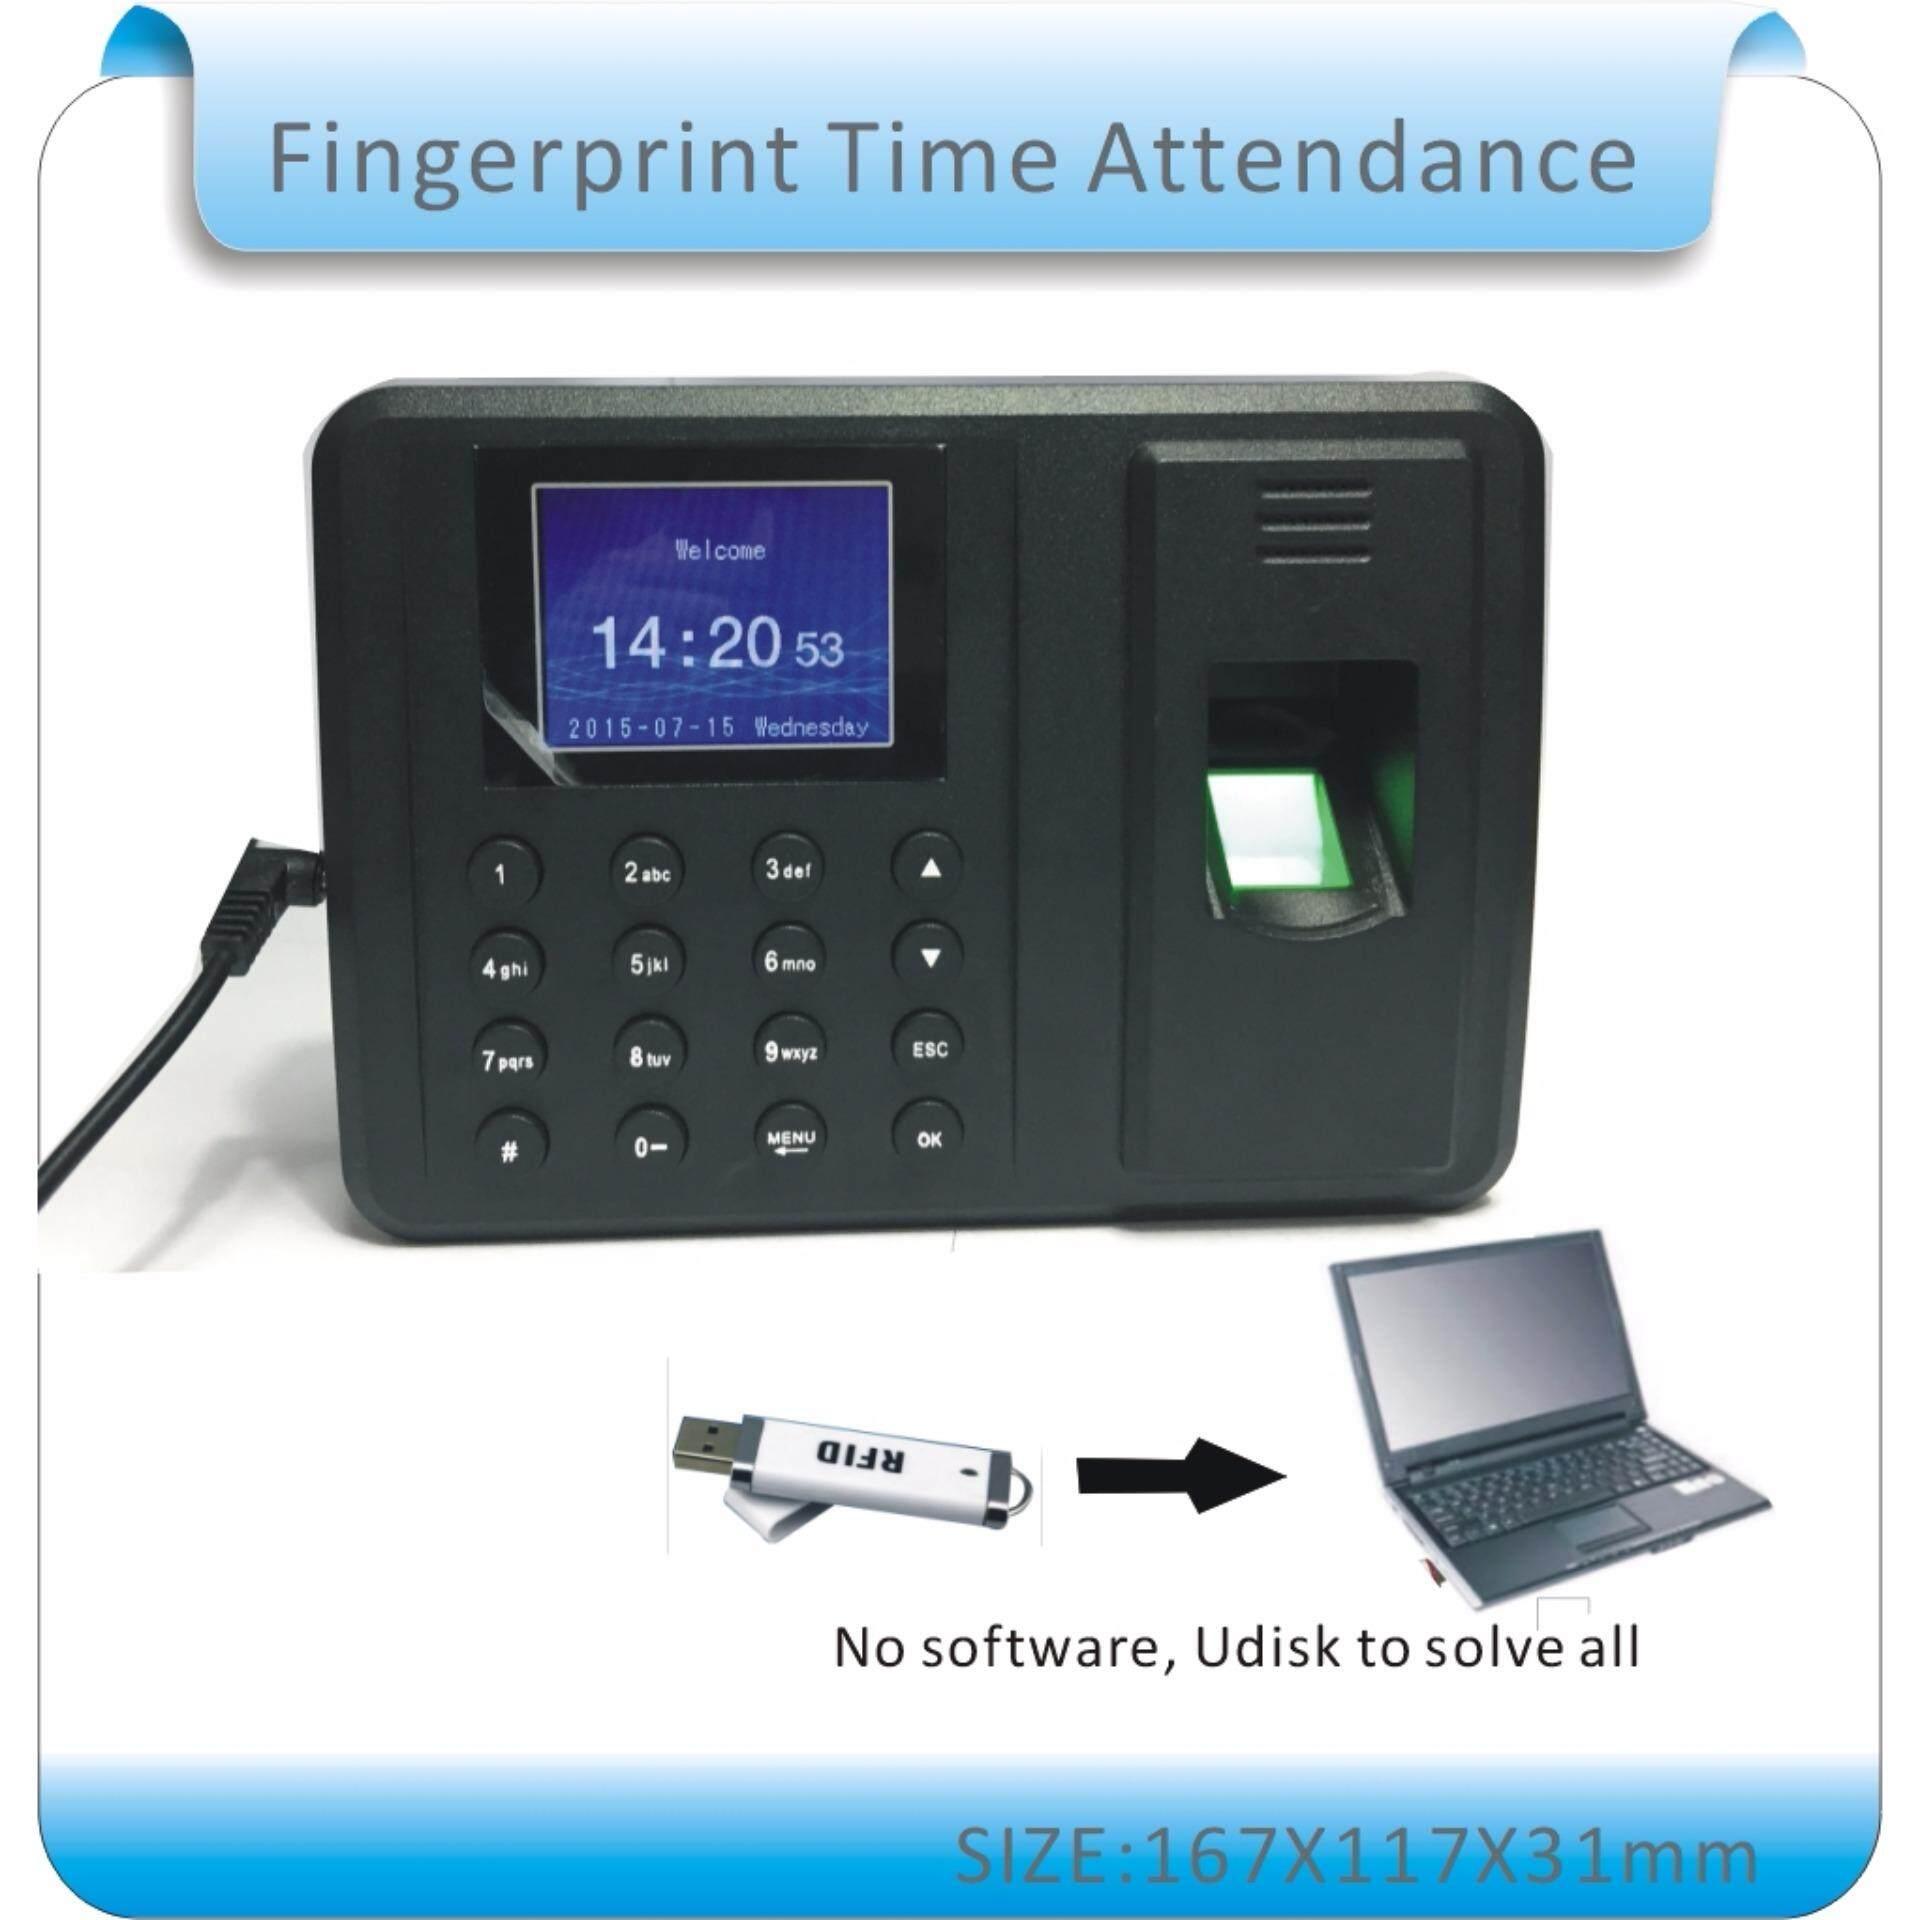 IMPORT KOREA FINGERPRINT ( 8 YEARS WARRANTY ) TIME ATTENDANCE RECORDER